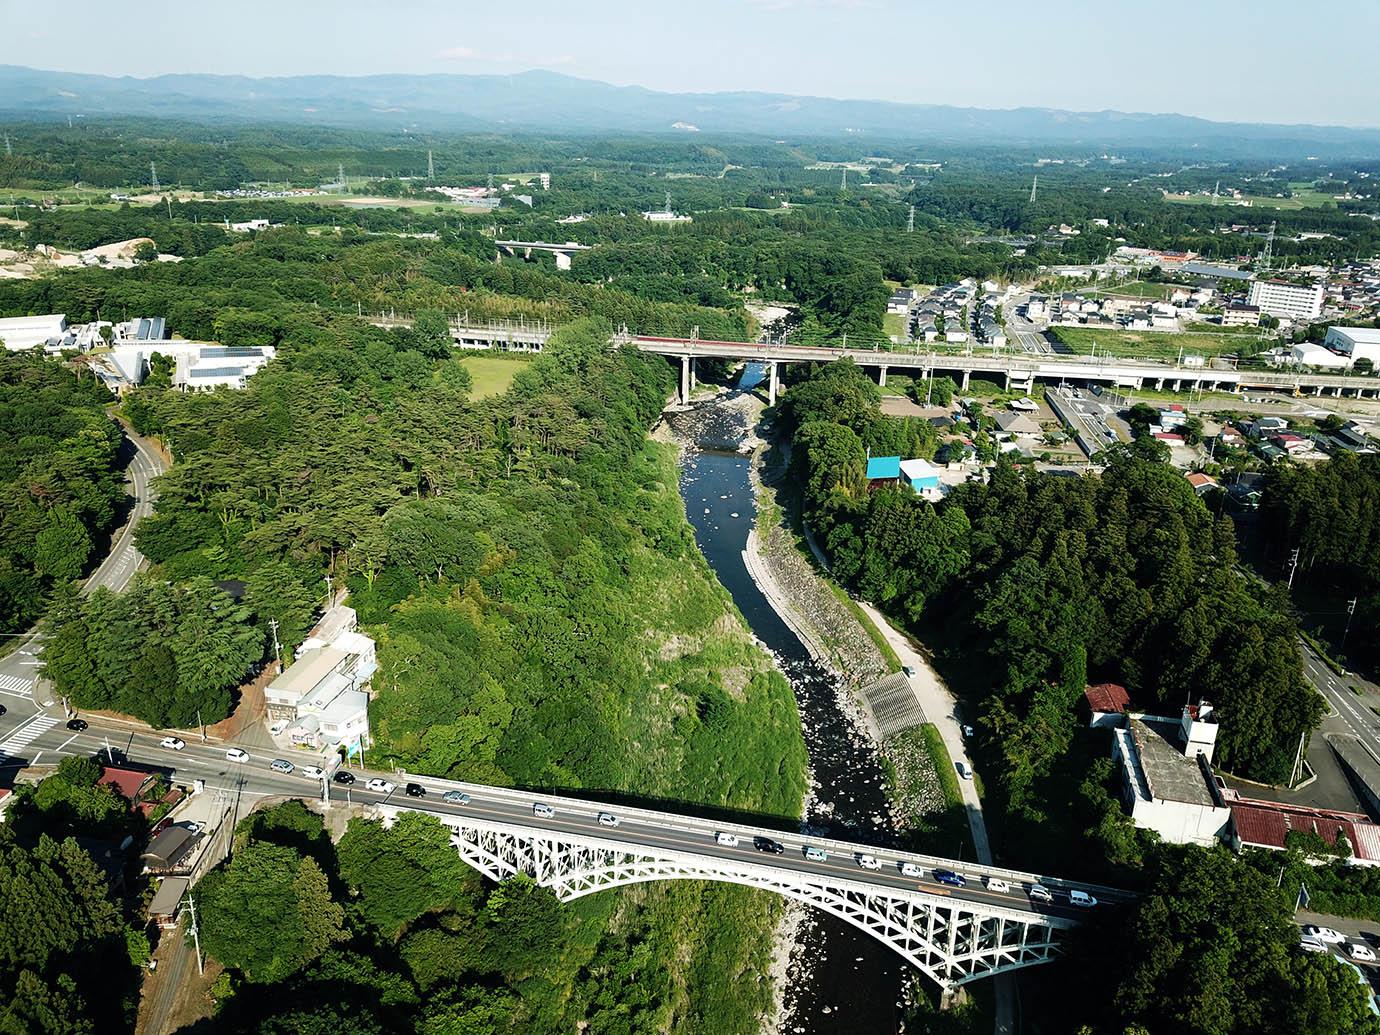 drone-superb-view-kuroiso-nakagawa2